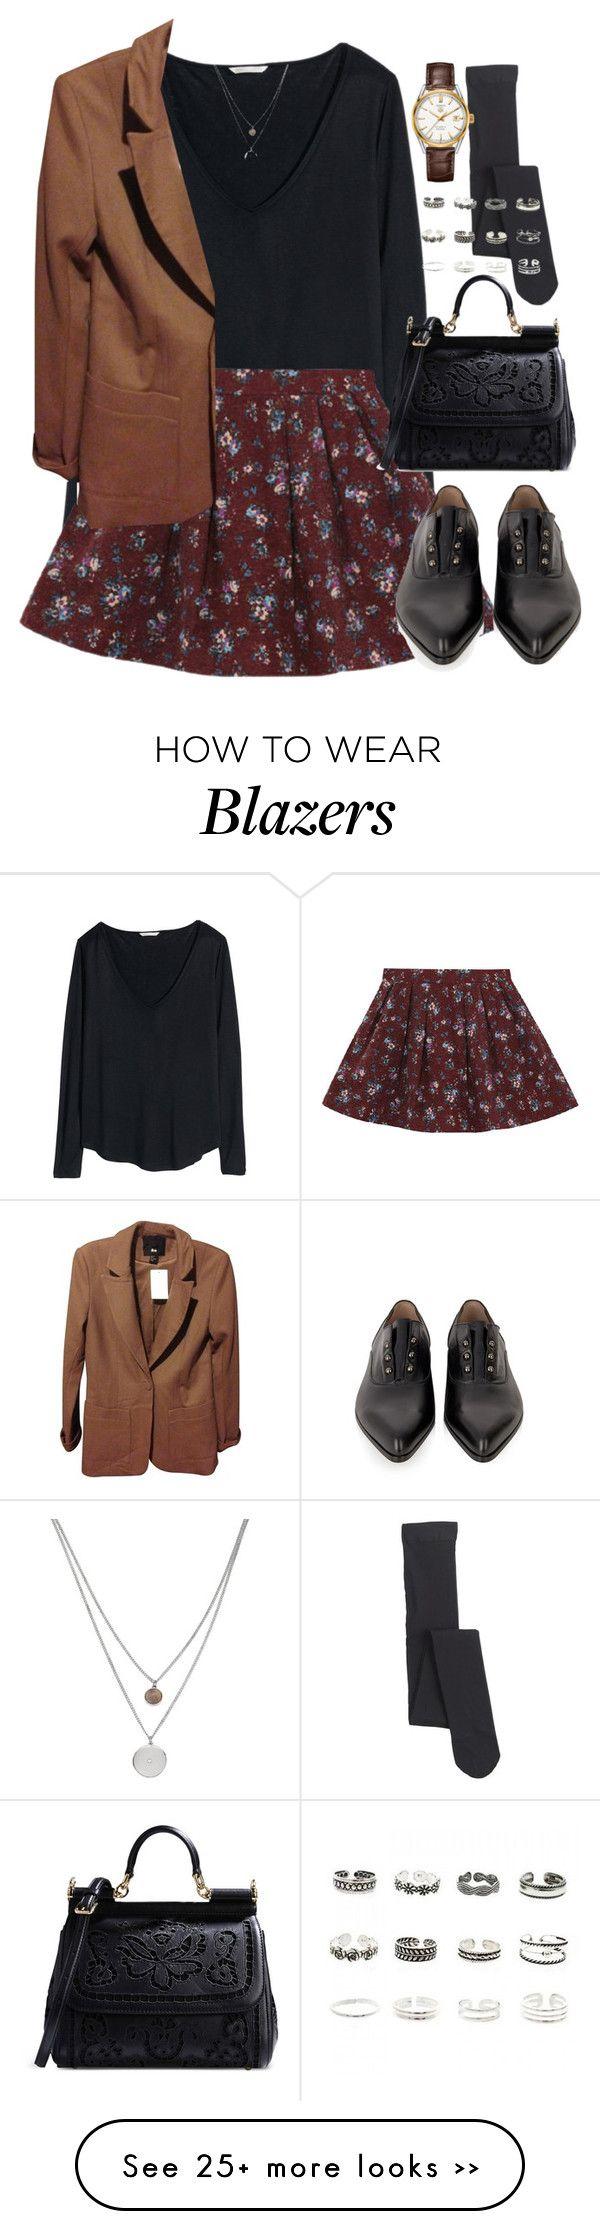 """Untitled #2919"" by peachv on Polyvore blazer, half sleeve shirt, patterned dress, socks, tights, oxfords"